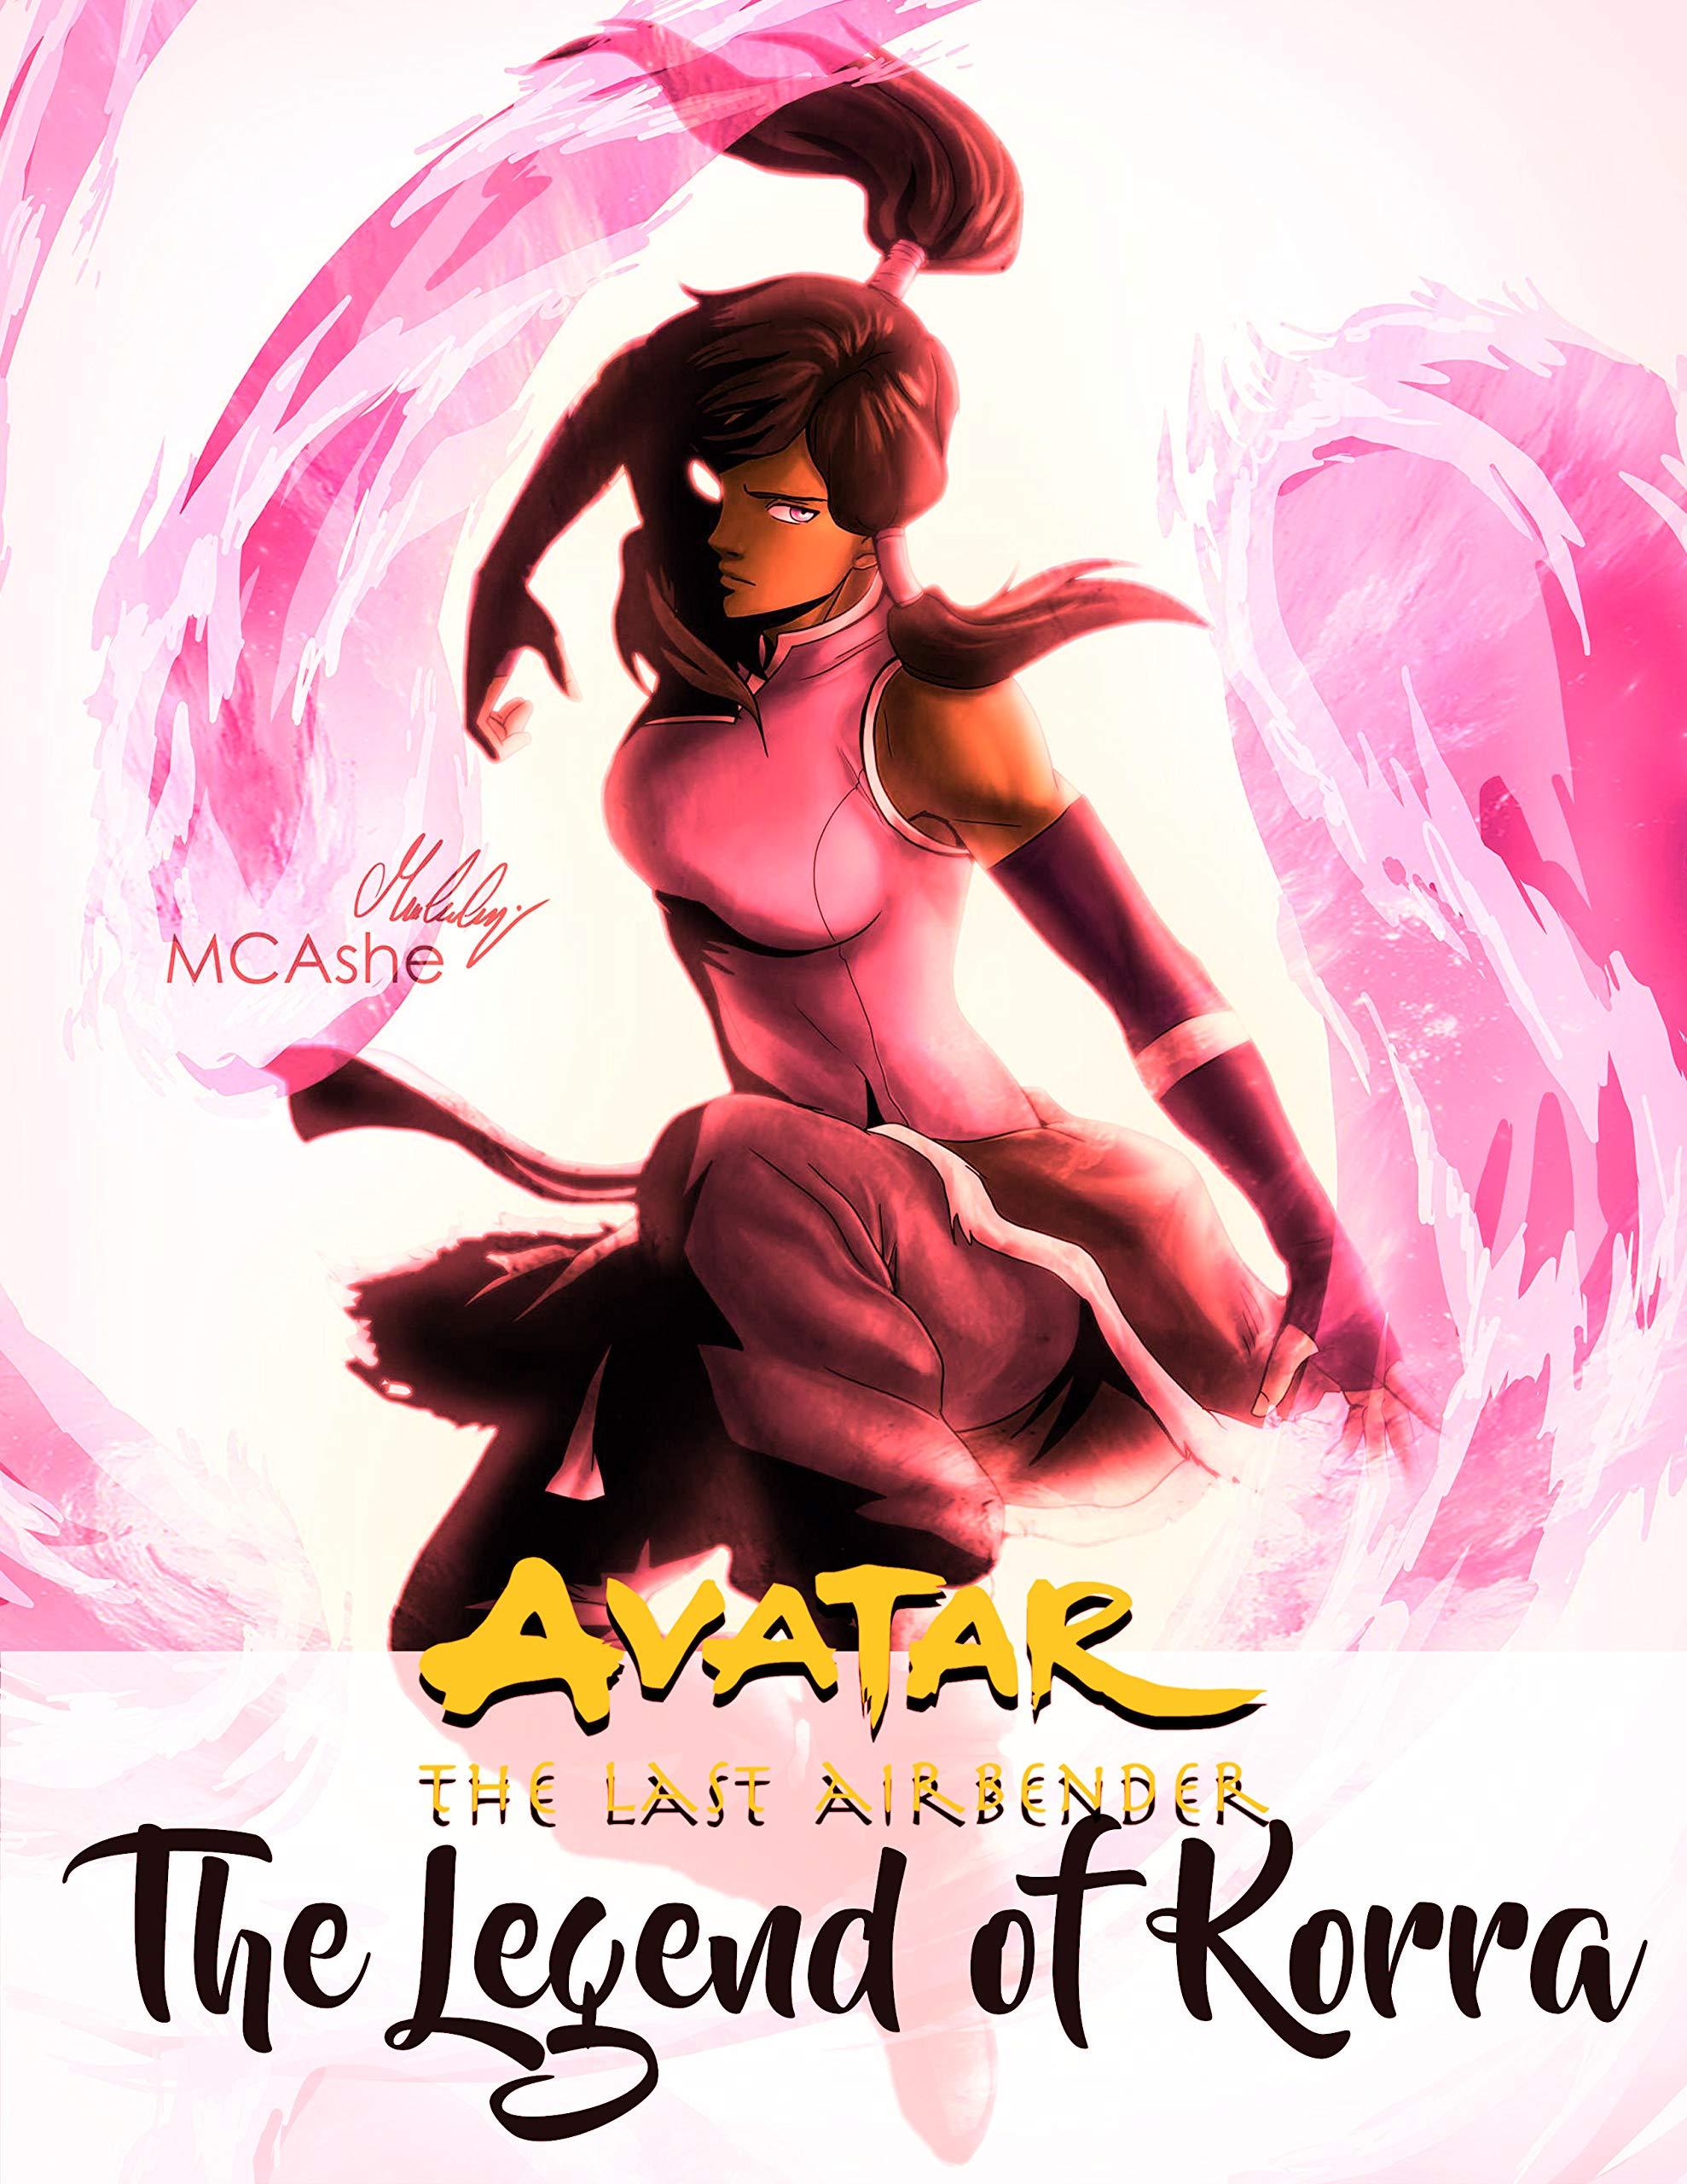 Avatar: The Last Airbender Legend of Korra 2018 Avatar American animated fantasy action-adventure television series comic